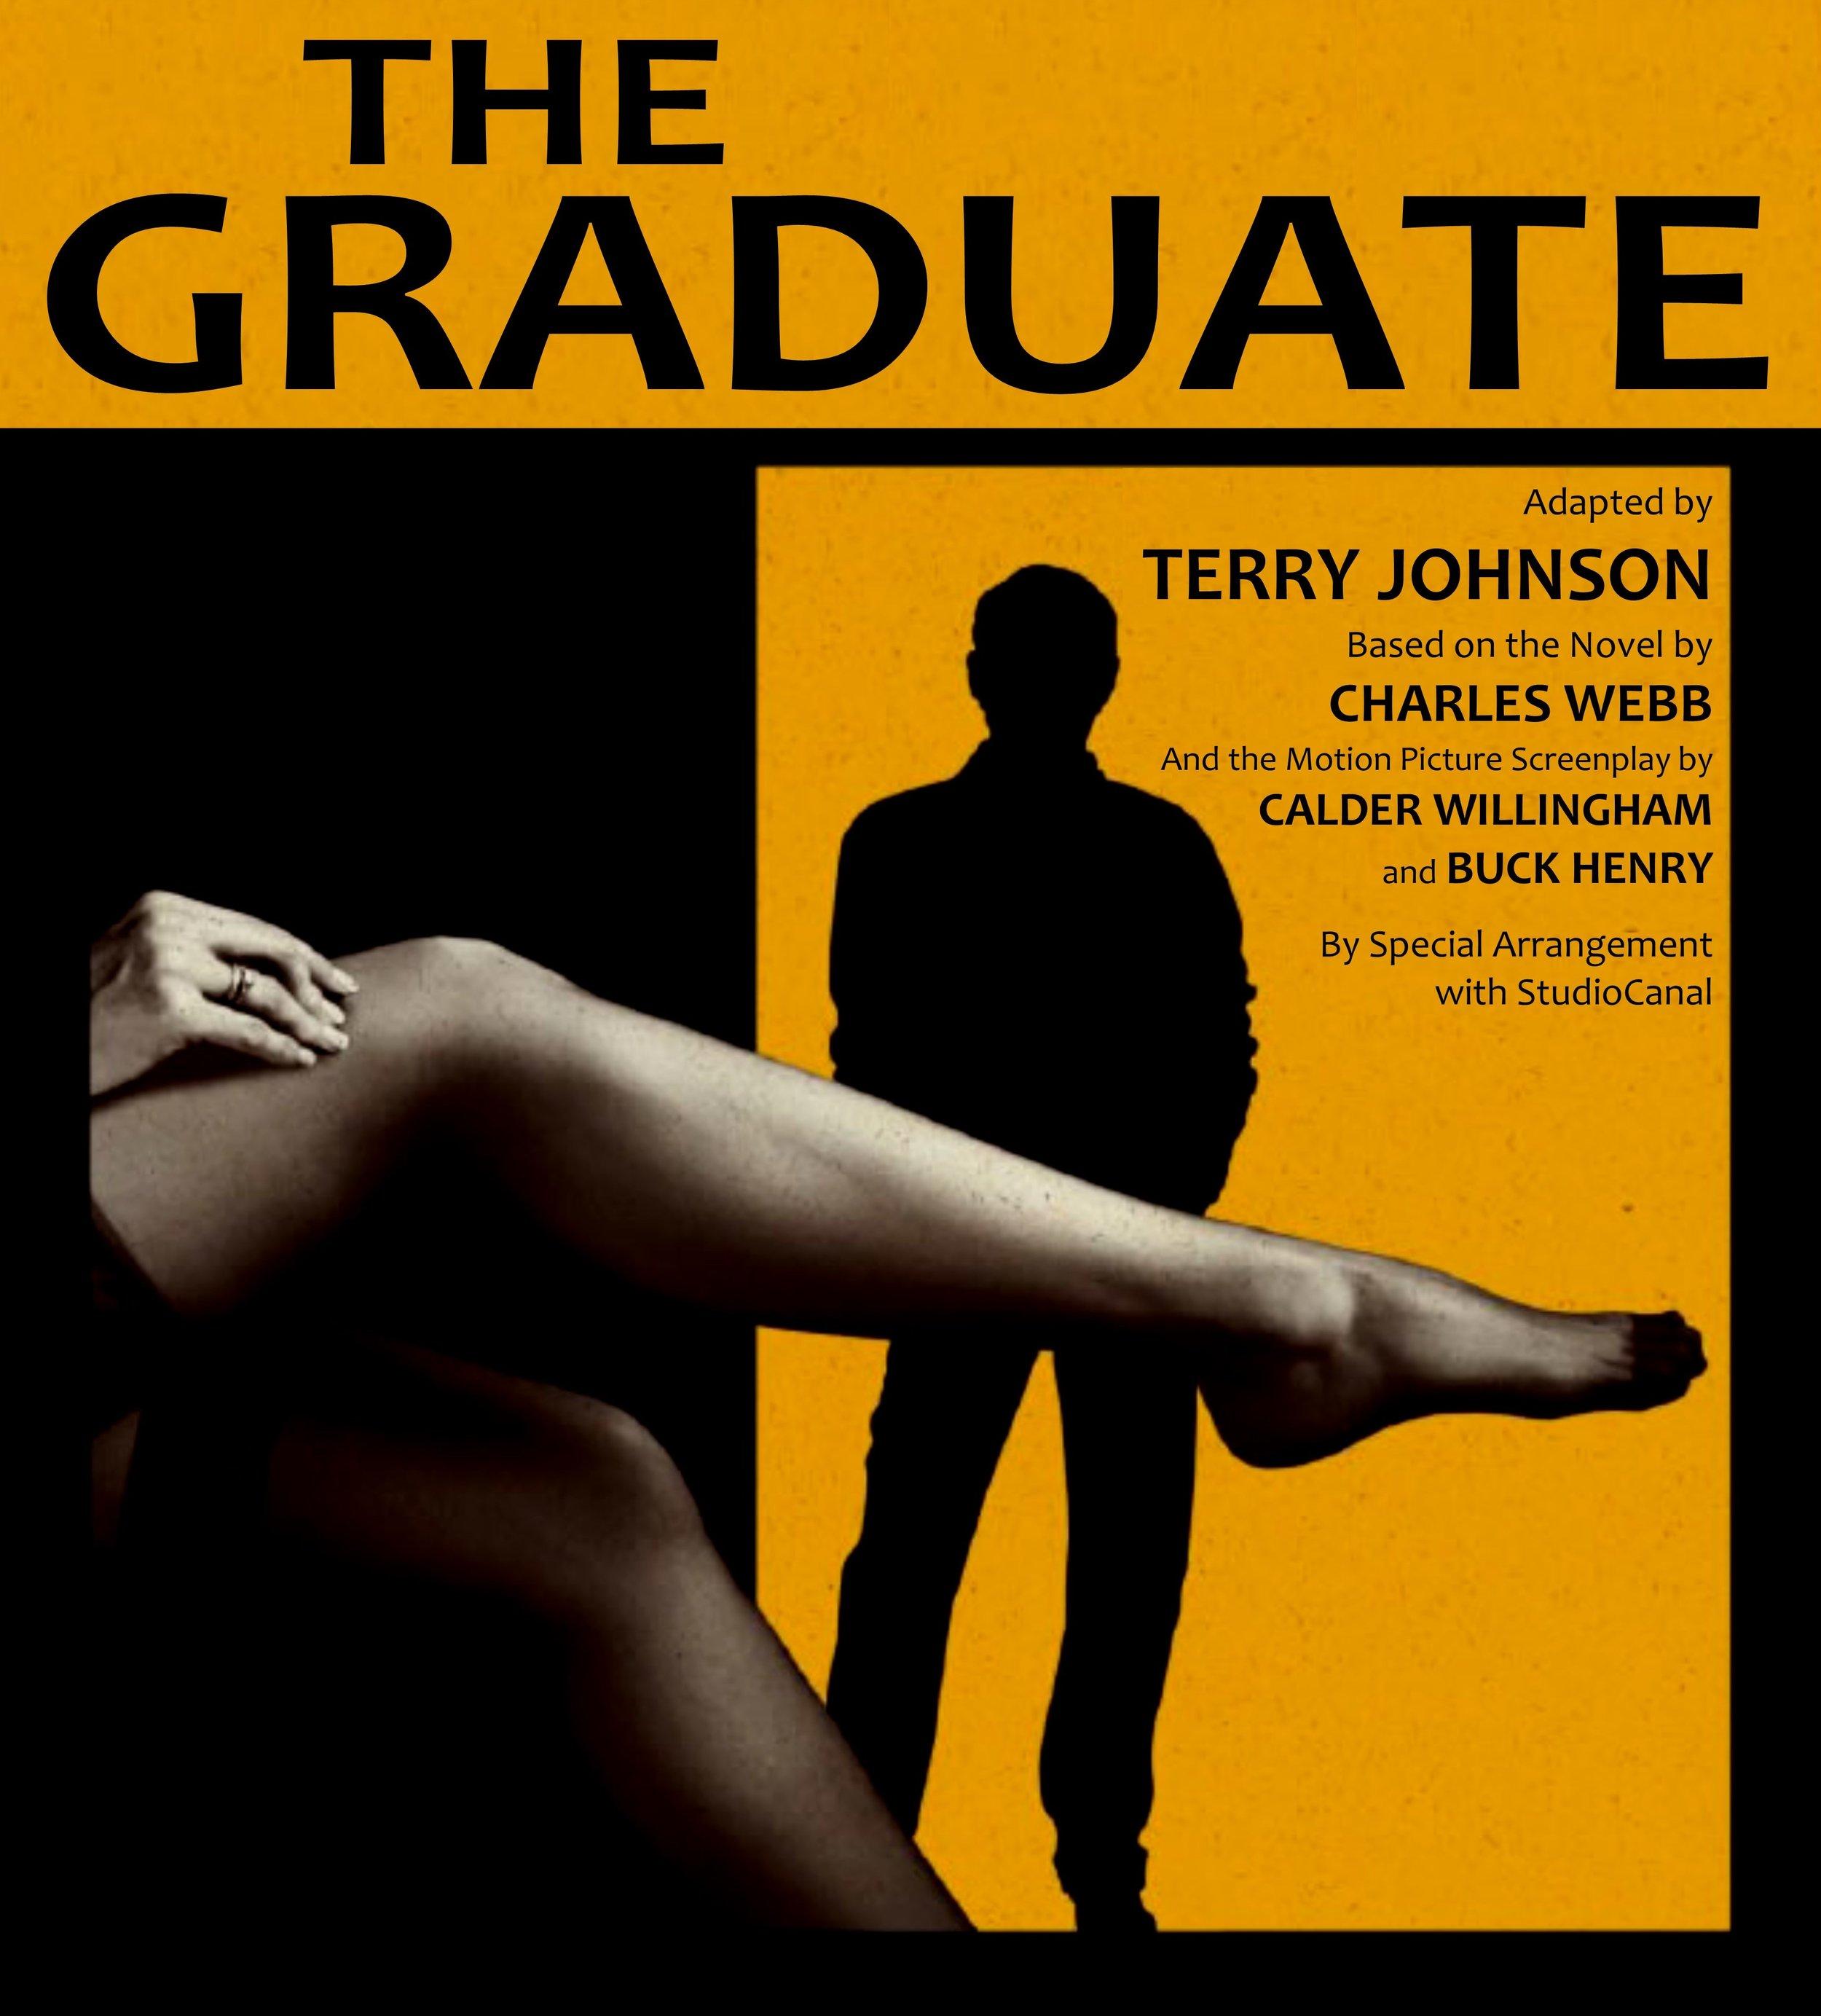 the graduate web image.jpg